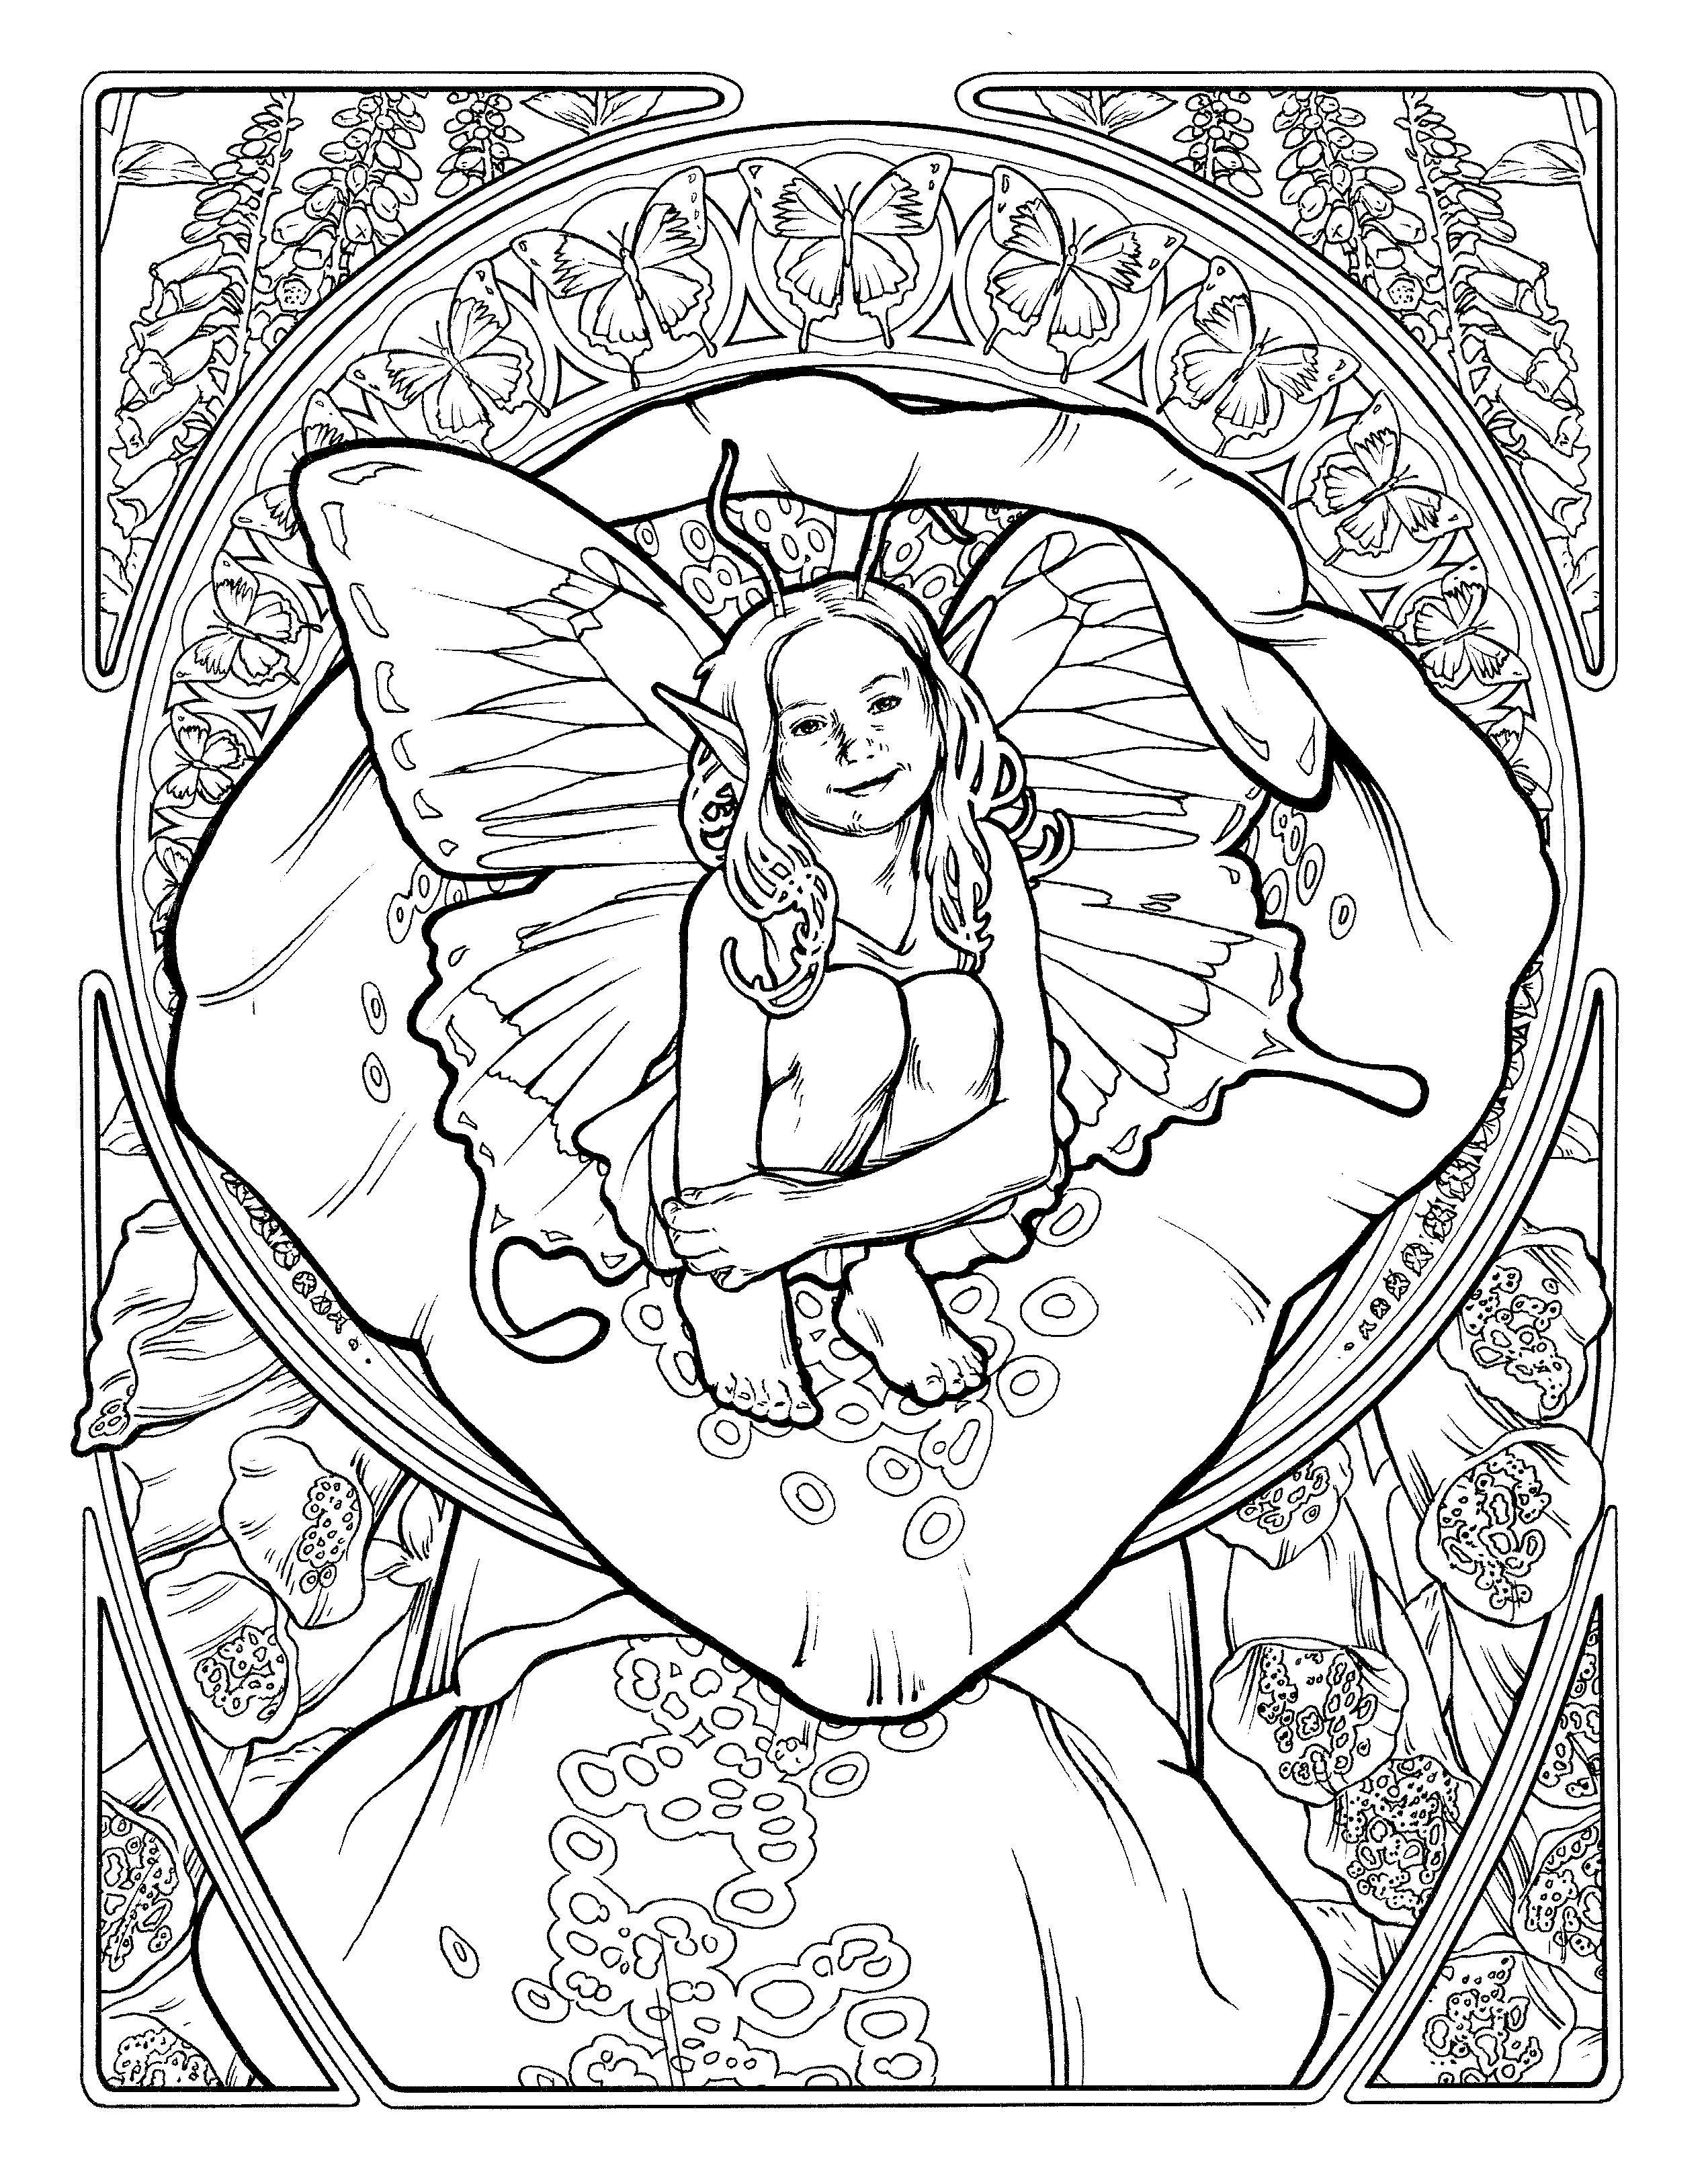 Pin by Brenda Mendenhall on Art I Like | Pinterest | Fairy, Coloring ...